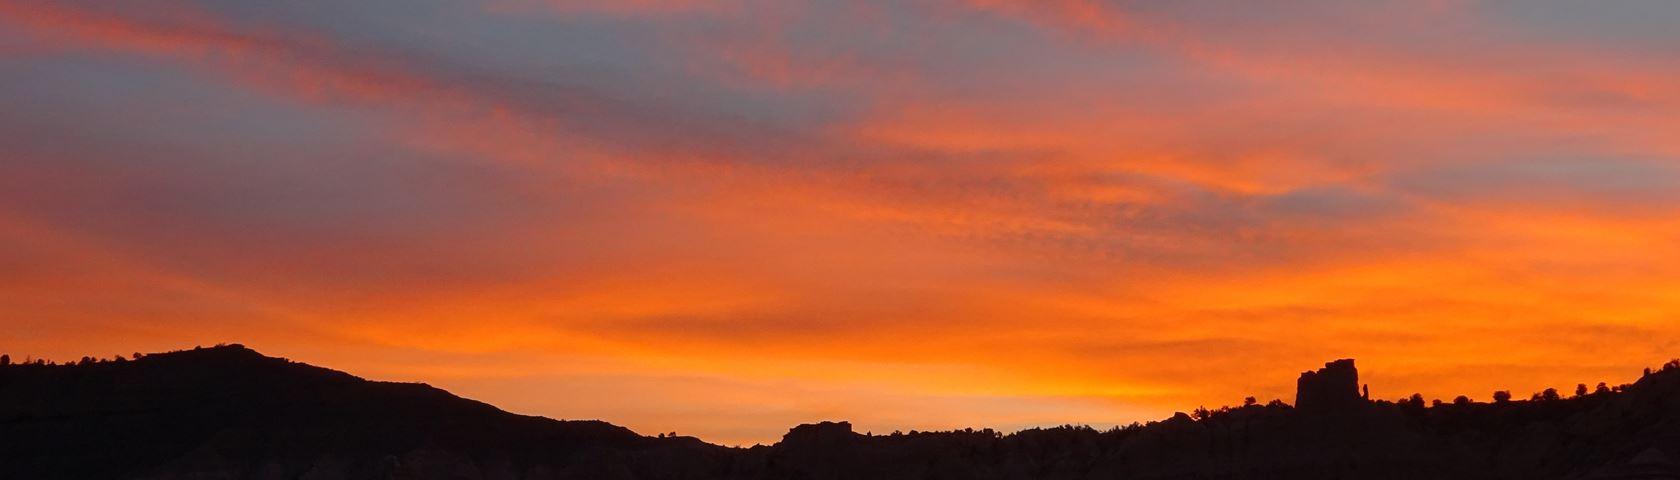 Sunrise in Cannonville